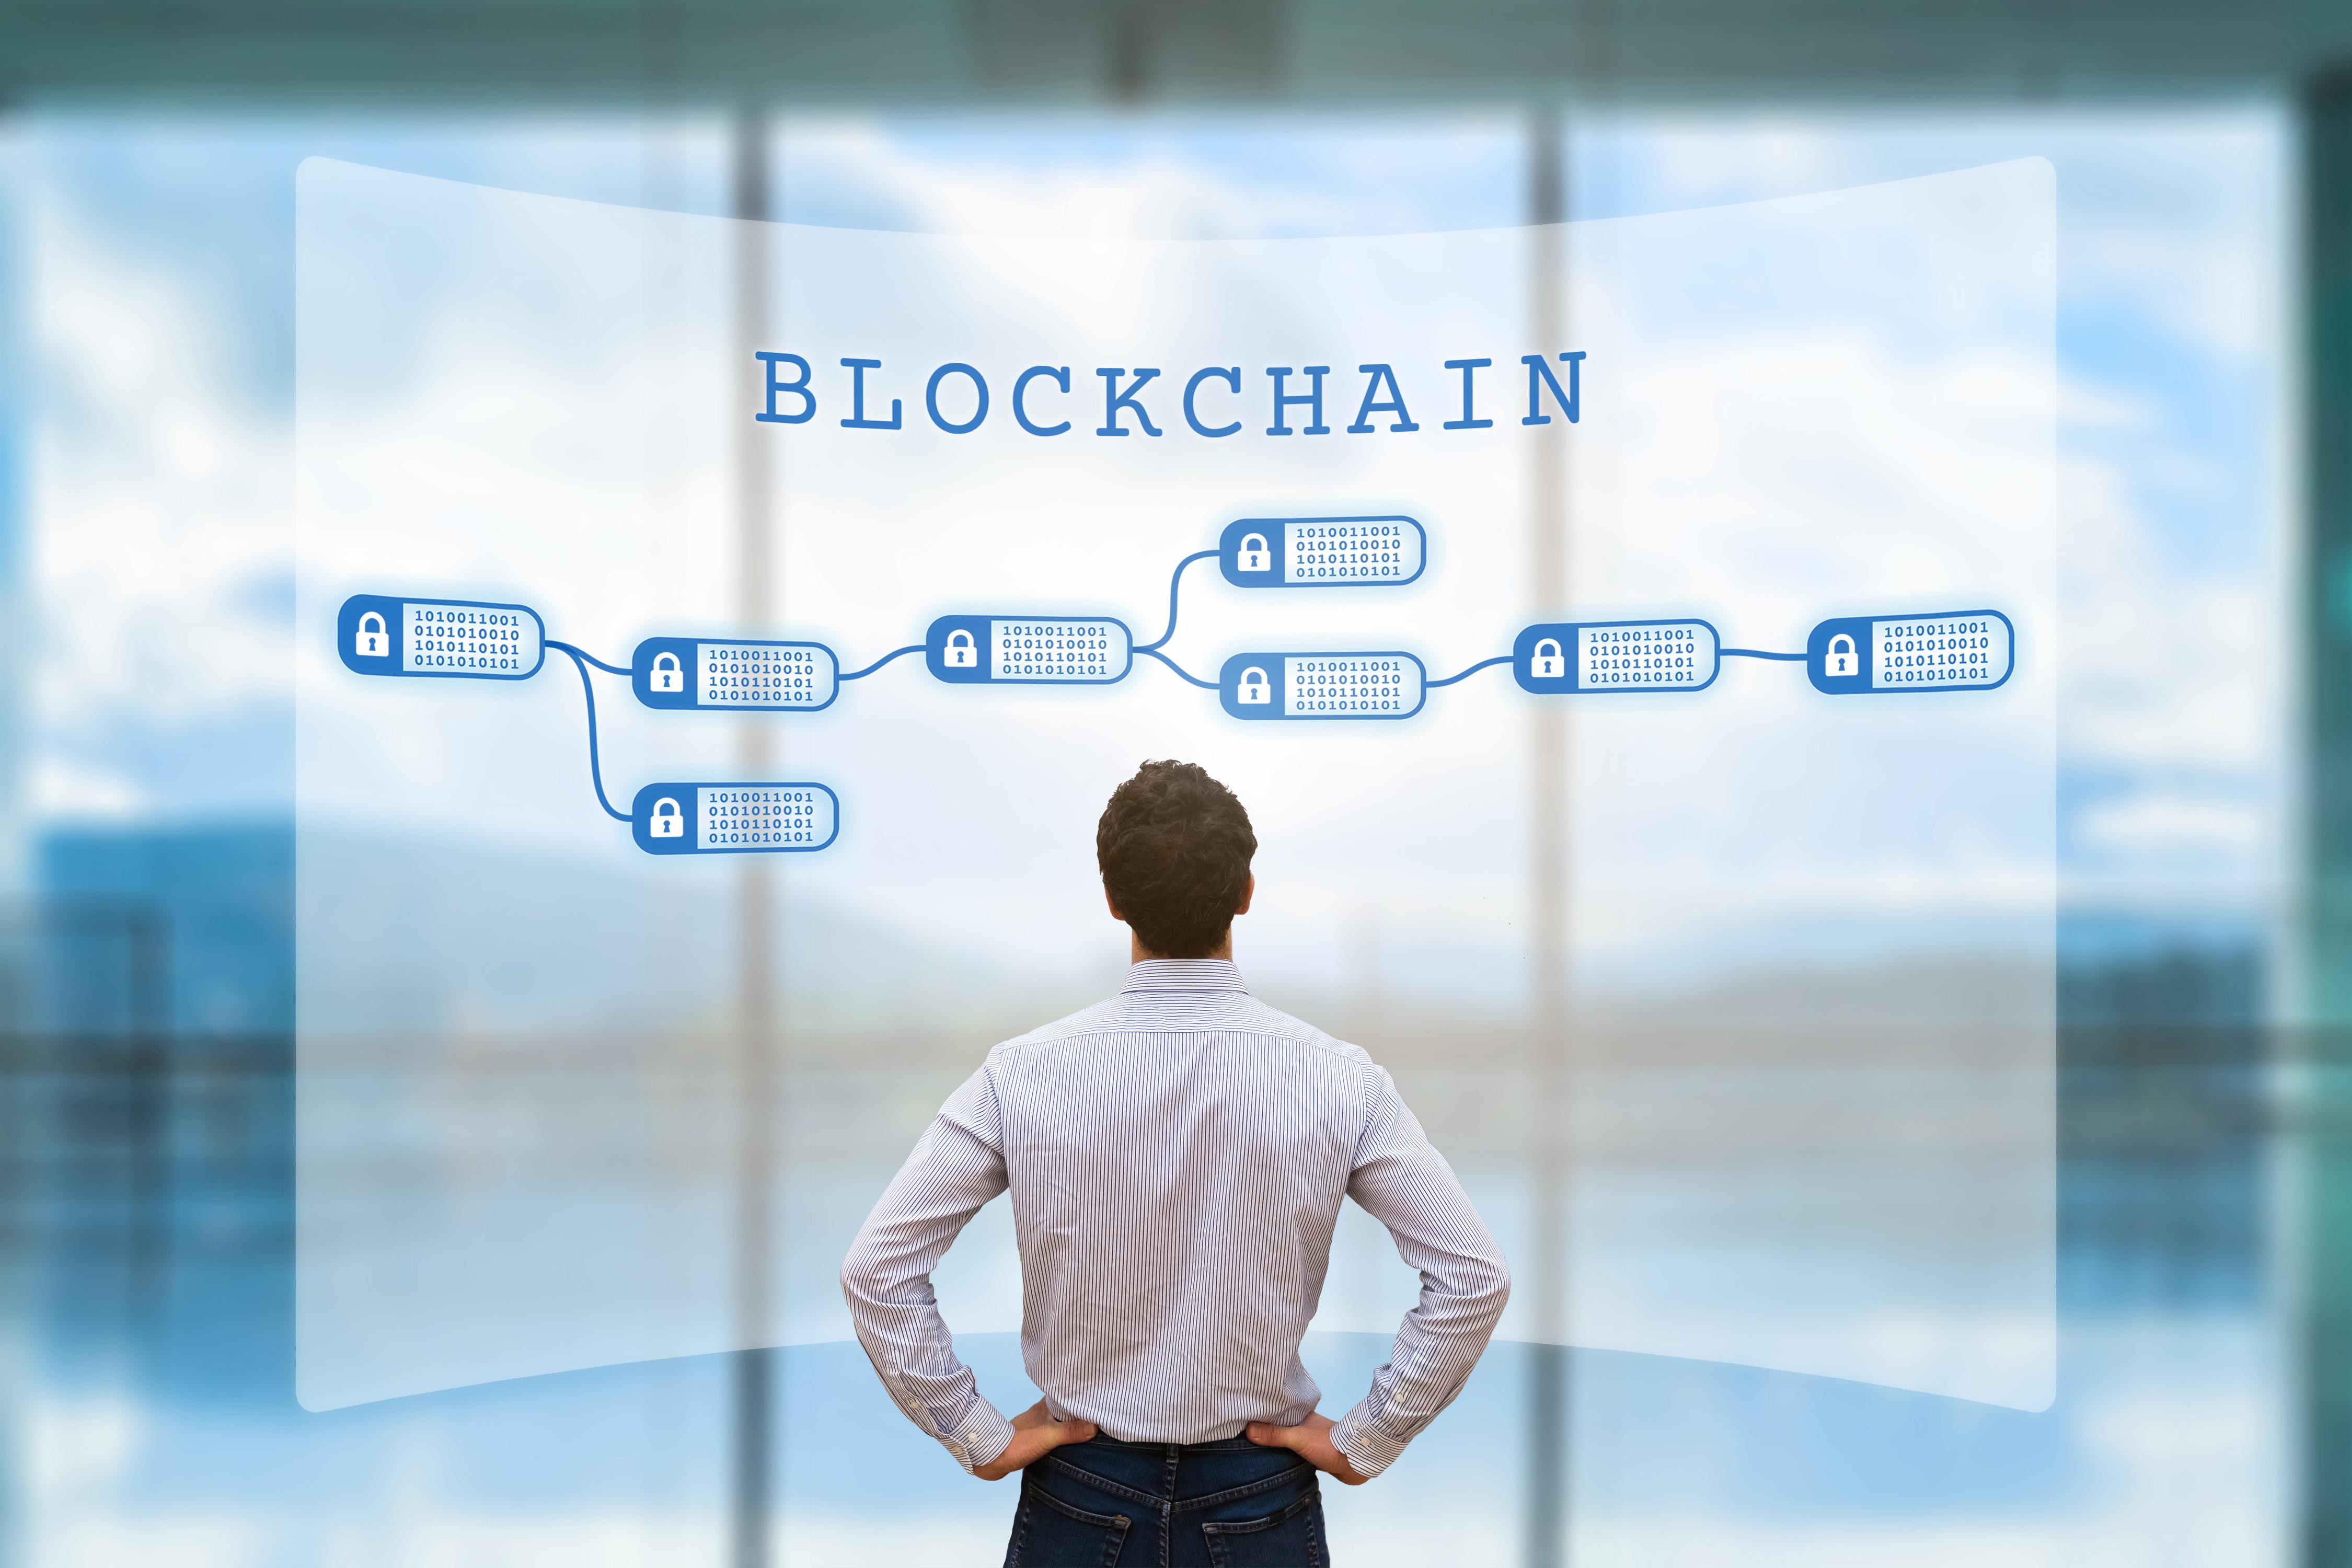 7 ways the blockchain will revolutionise marketing